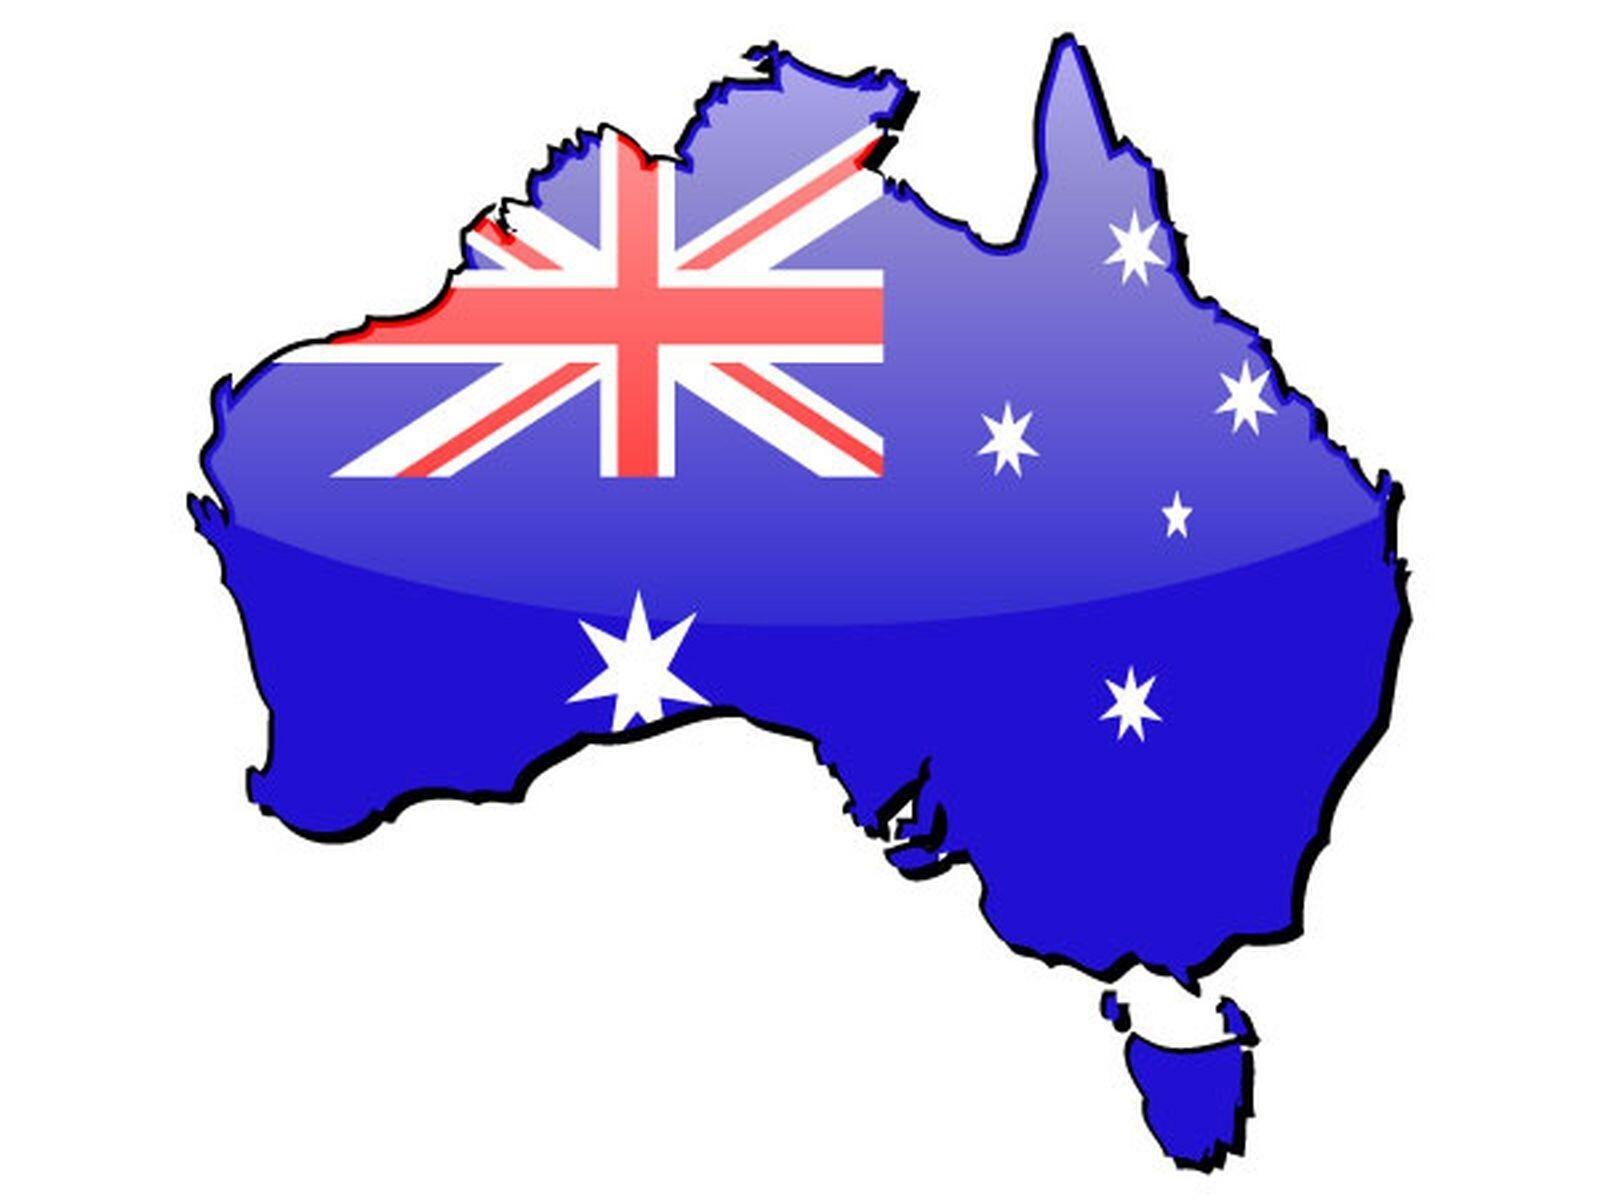 Map Of Australia Hd.Hd Australia Map Flag Photo Hd Wallpapers